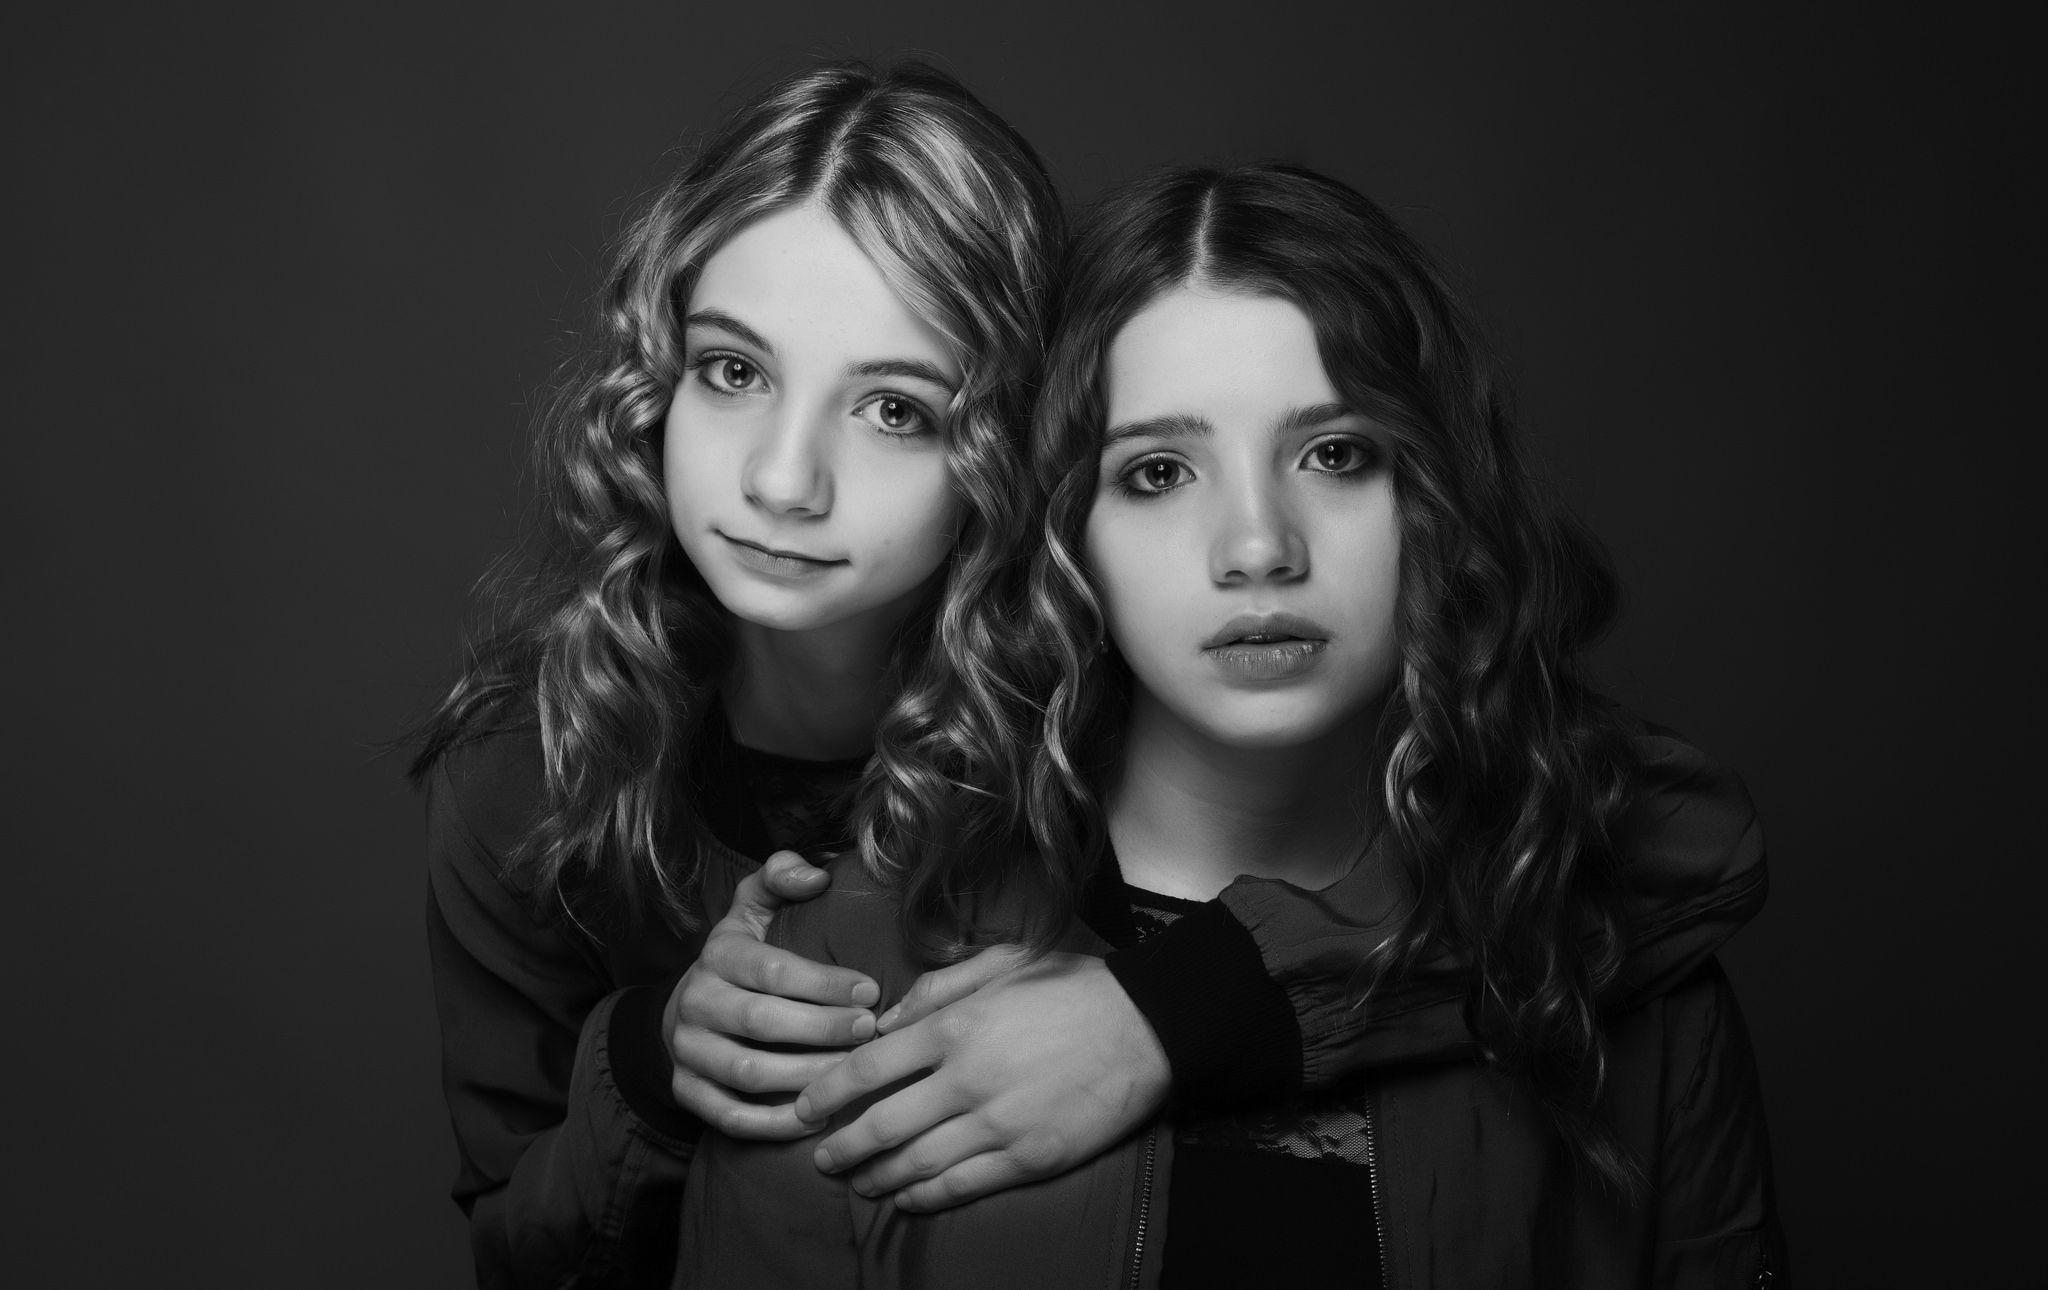 https://flic.kr/p/TuyqW9   sisters   Studio work